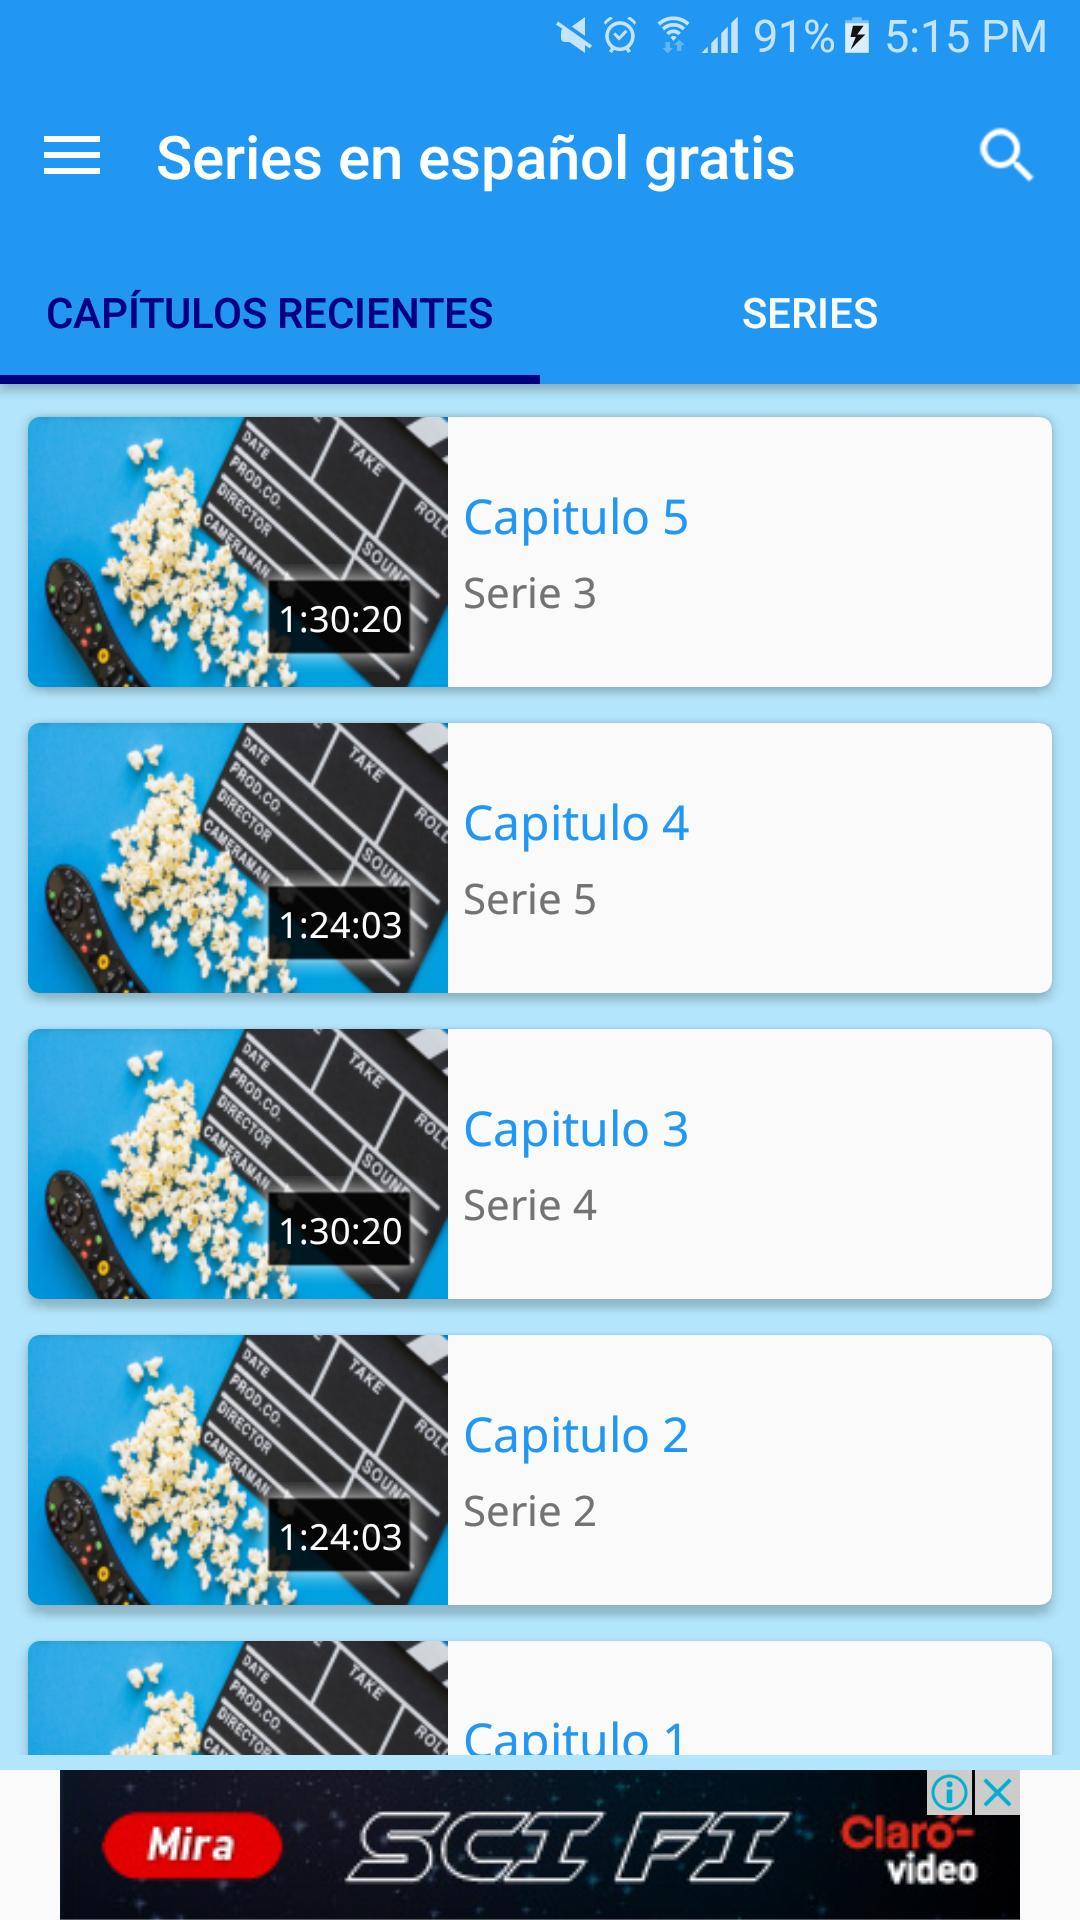 series gratis en español